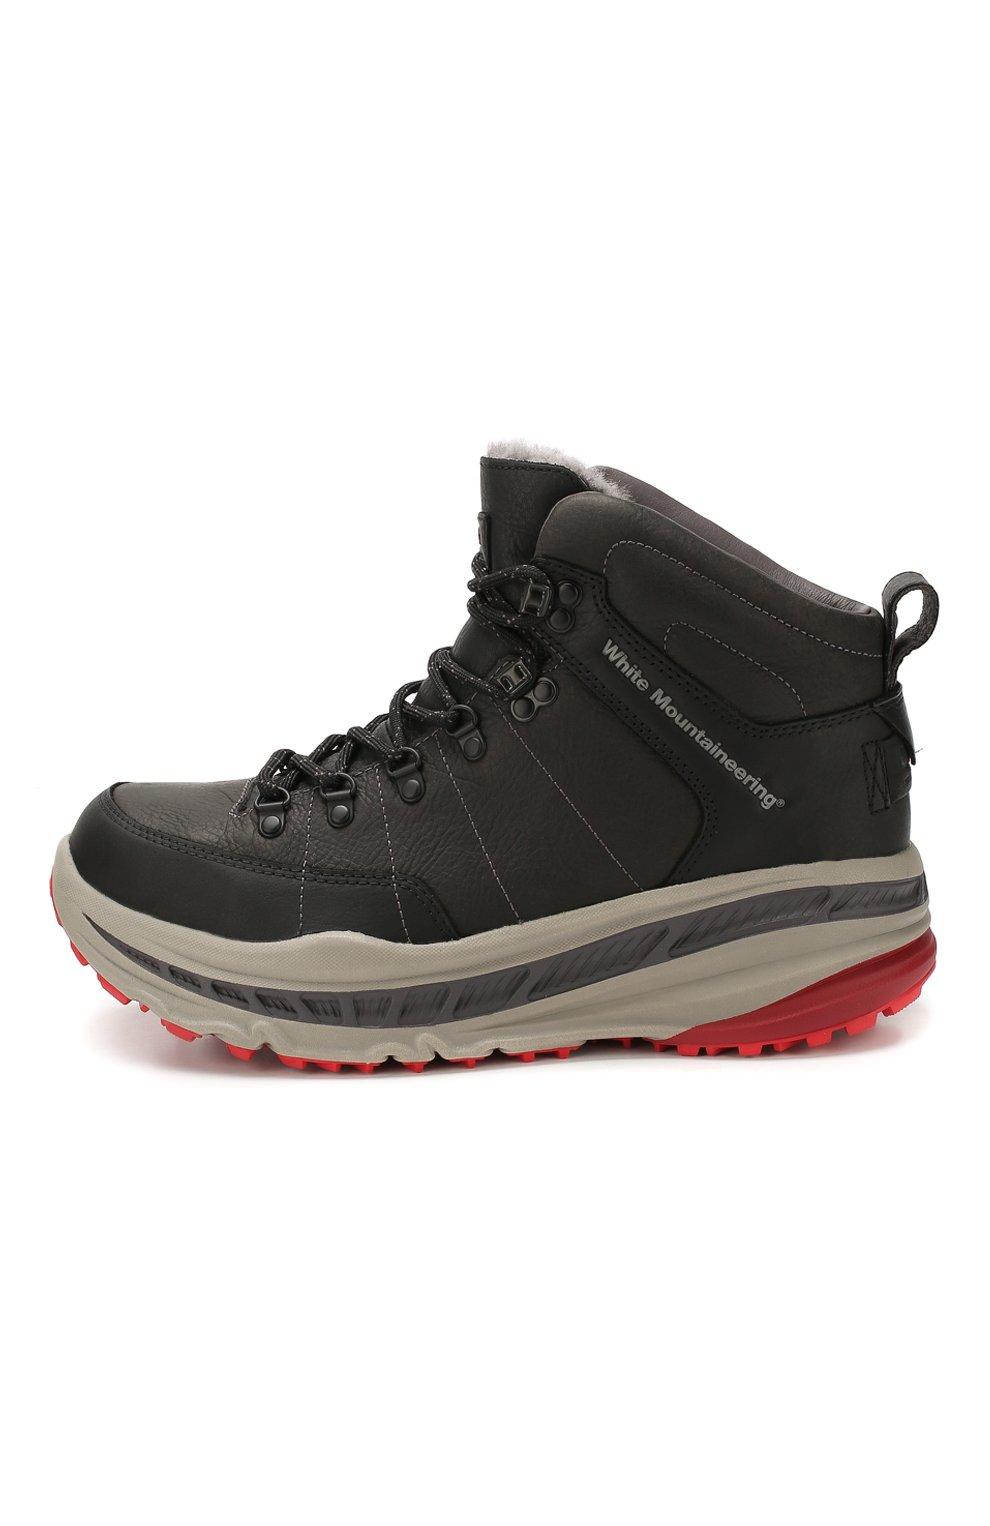 Мужские кожаные ботинки ugg x white mountaineering 805 hiker UGG черного цвета, арт. 1108650_BLK   Фото 3